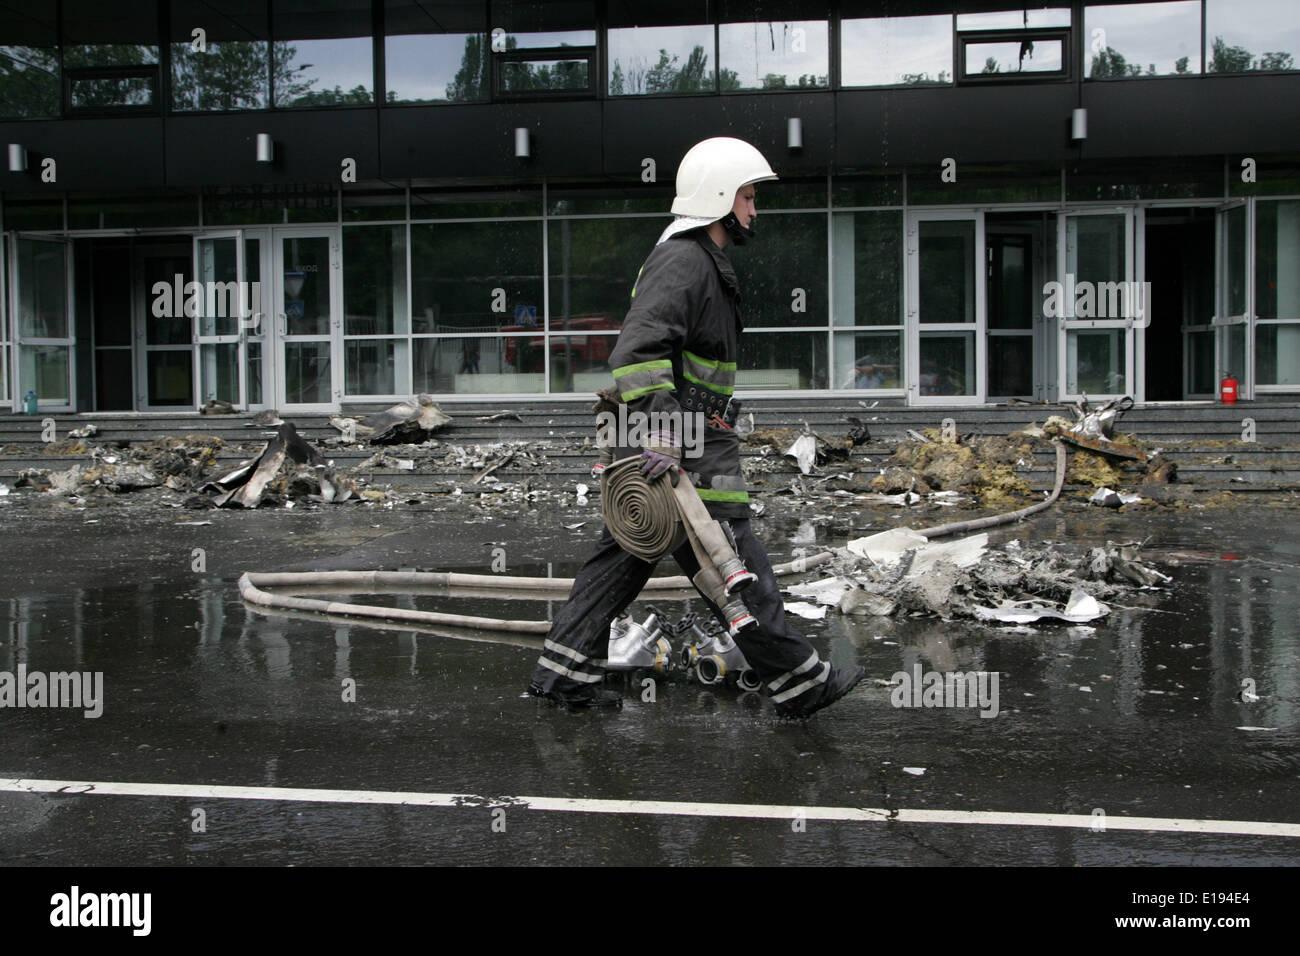 Donetsk, Ukraine. 27th May, 2014. A firefighter works at the burnt Druzhba Hockey Arena in Donetsk, Ukraine, May - Stock Image